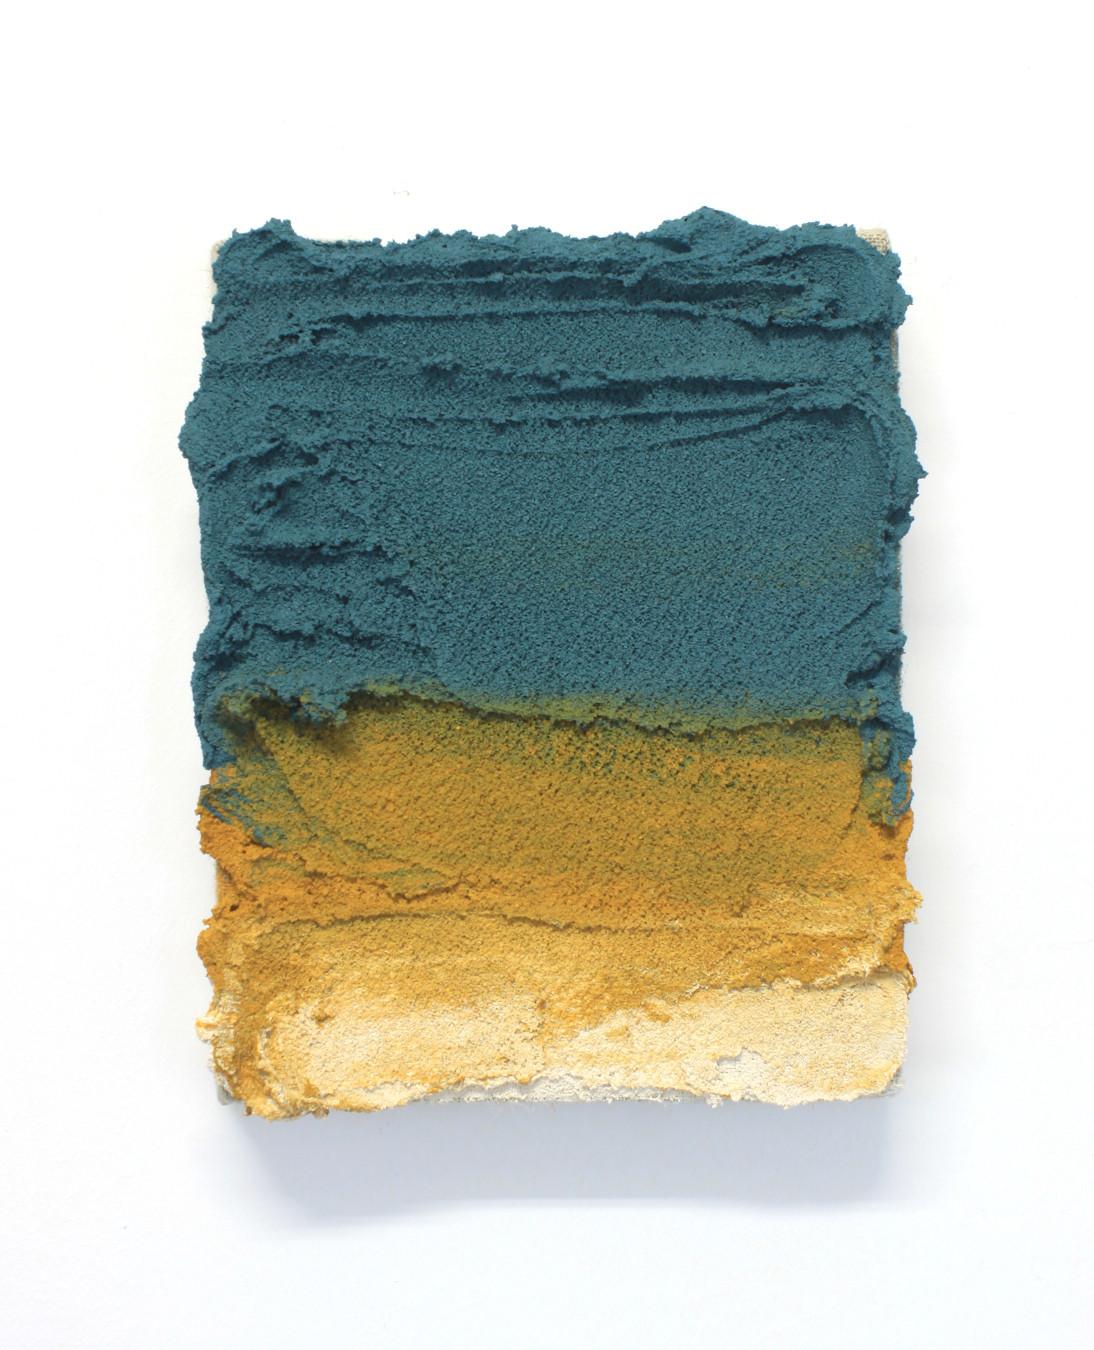 PR27, 2020. Acrylic, sand and limestone on linen. 20 x 16 cm.